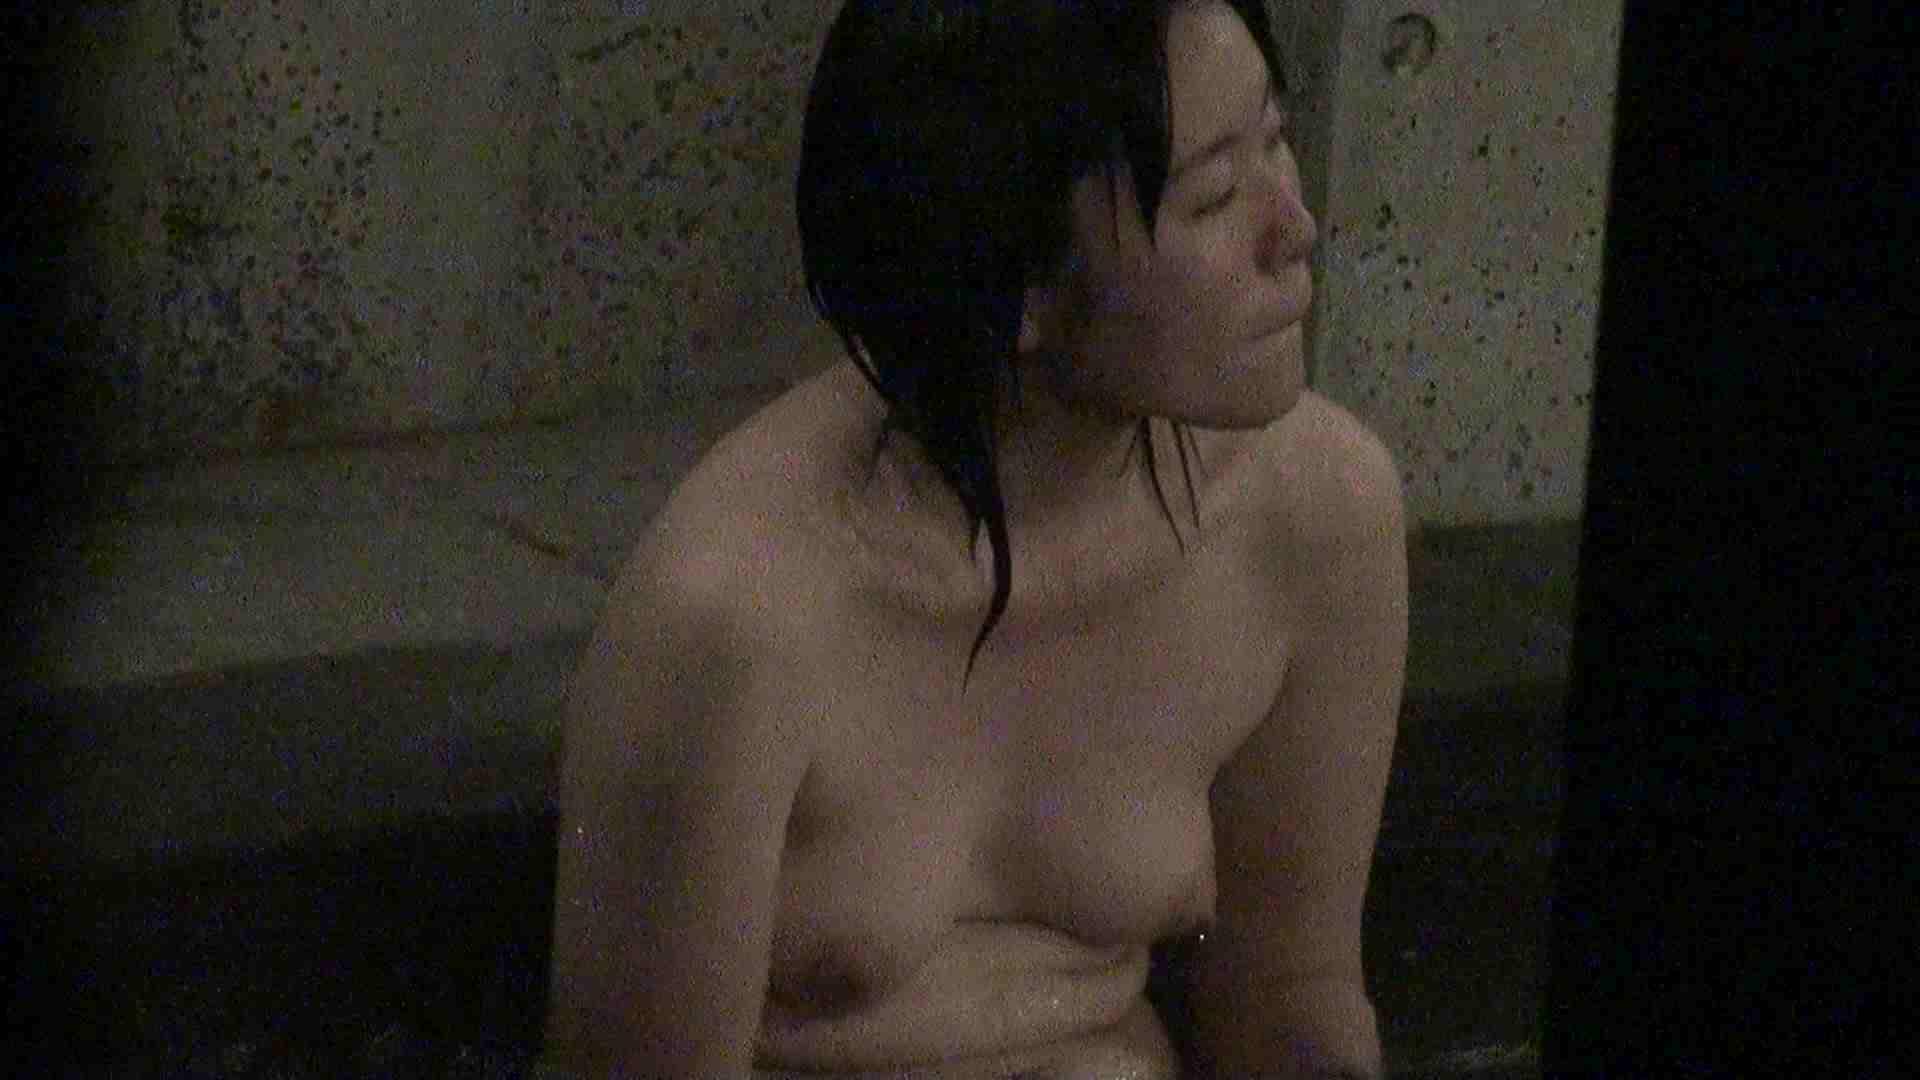 Aquaな露天風呂Vol.369 露天風呂 ワレメ動画紹介 108連発 92